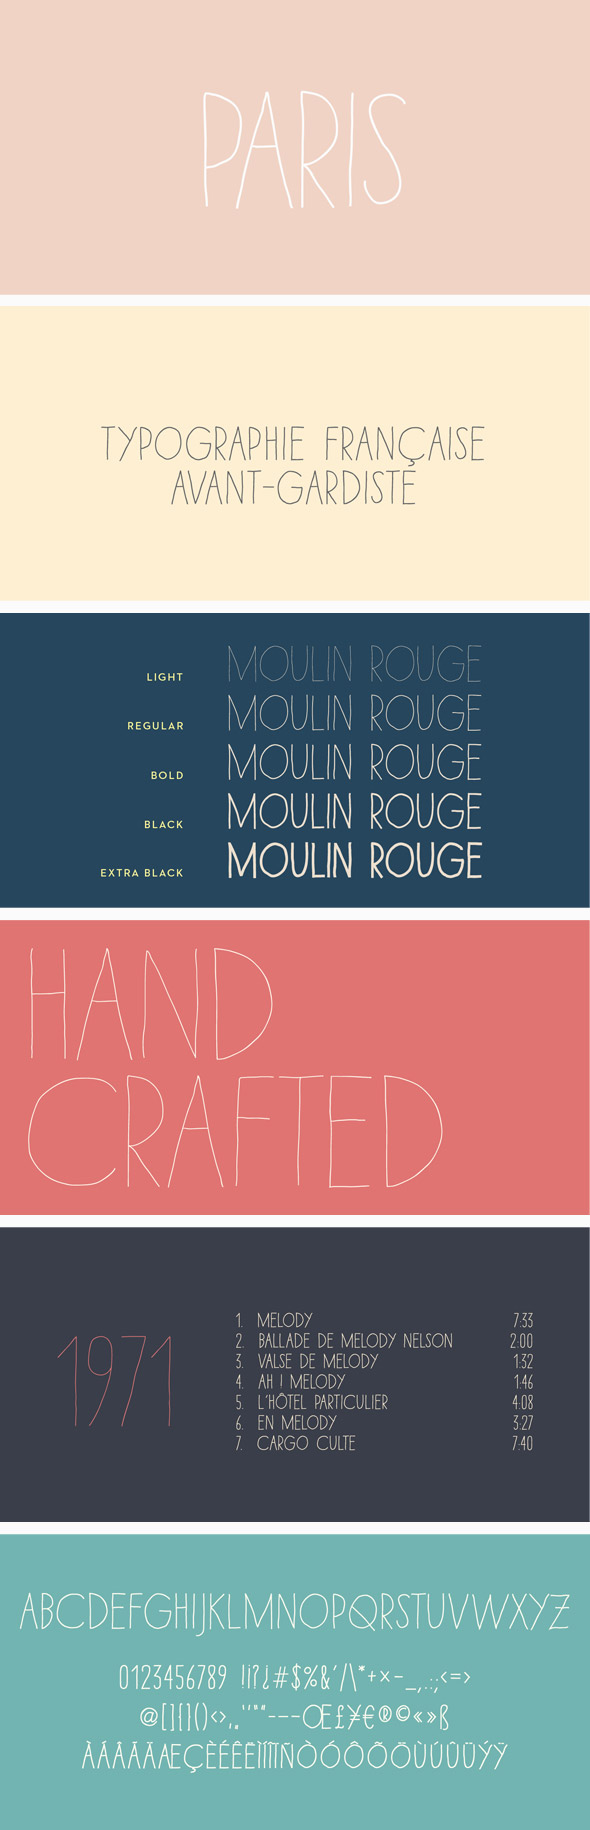 Paris Font Pack - Handwriting Fonts